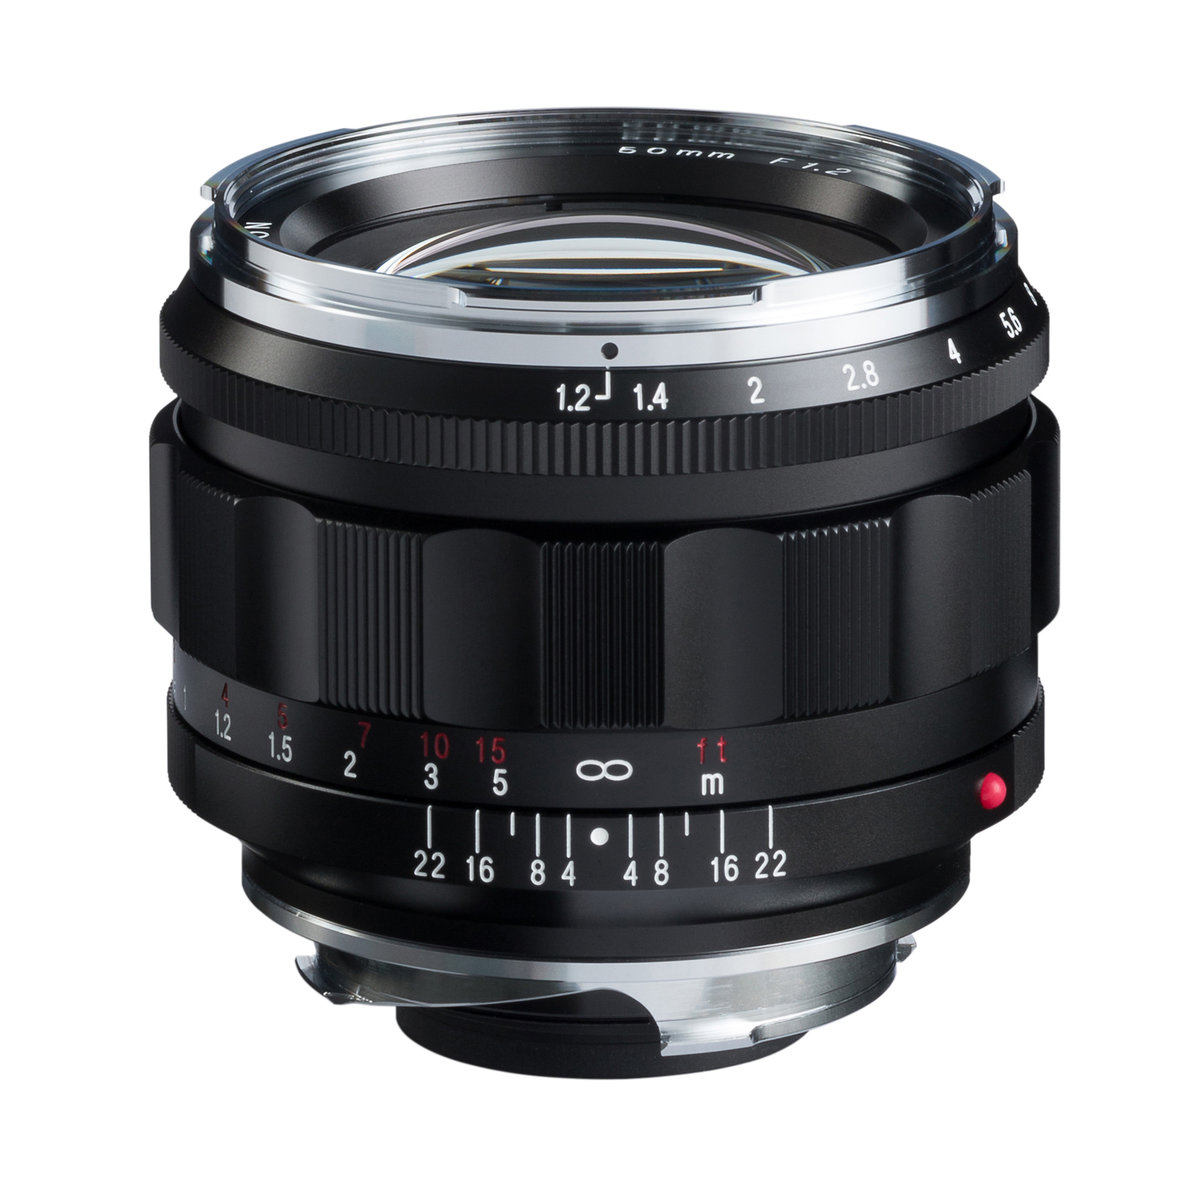 Nokon 50mmF1.2 Aspherical Lens VM-Mount